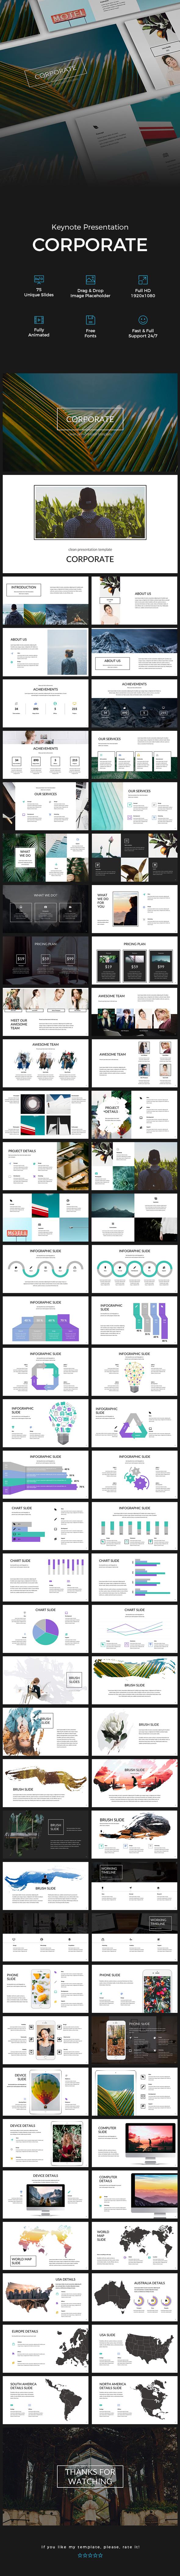 GraphicRiver Corporate Keynote Presentation 21069322